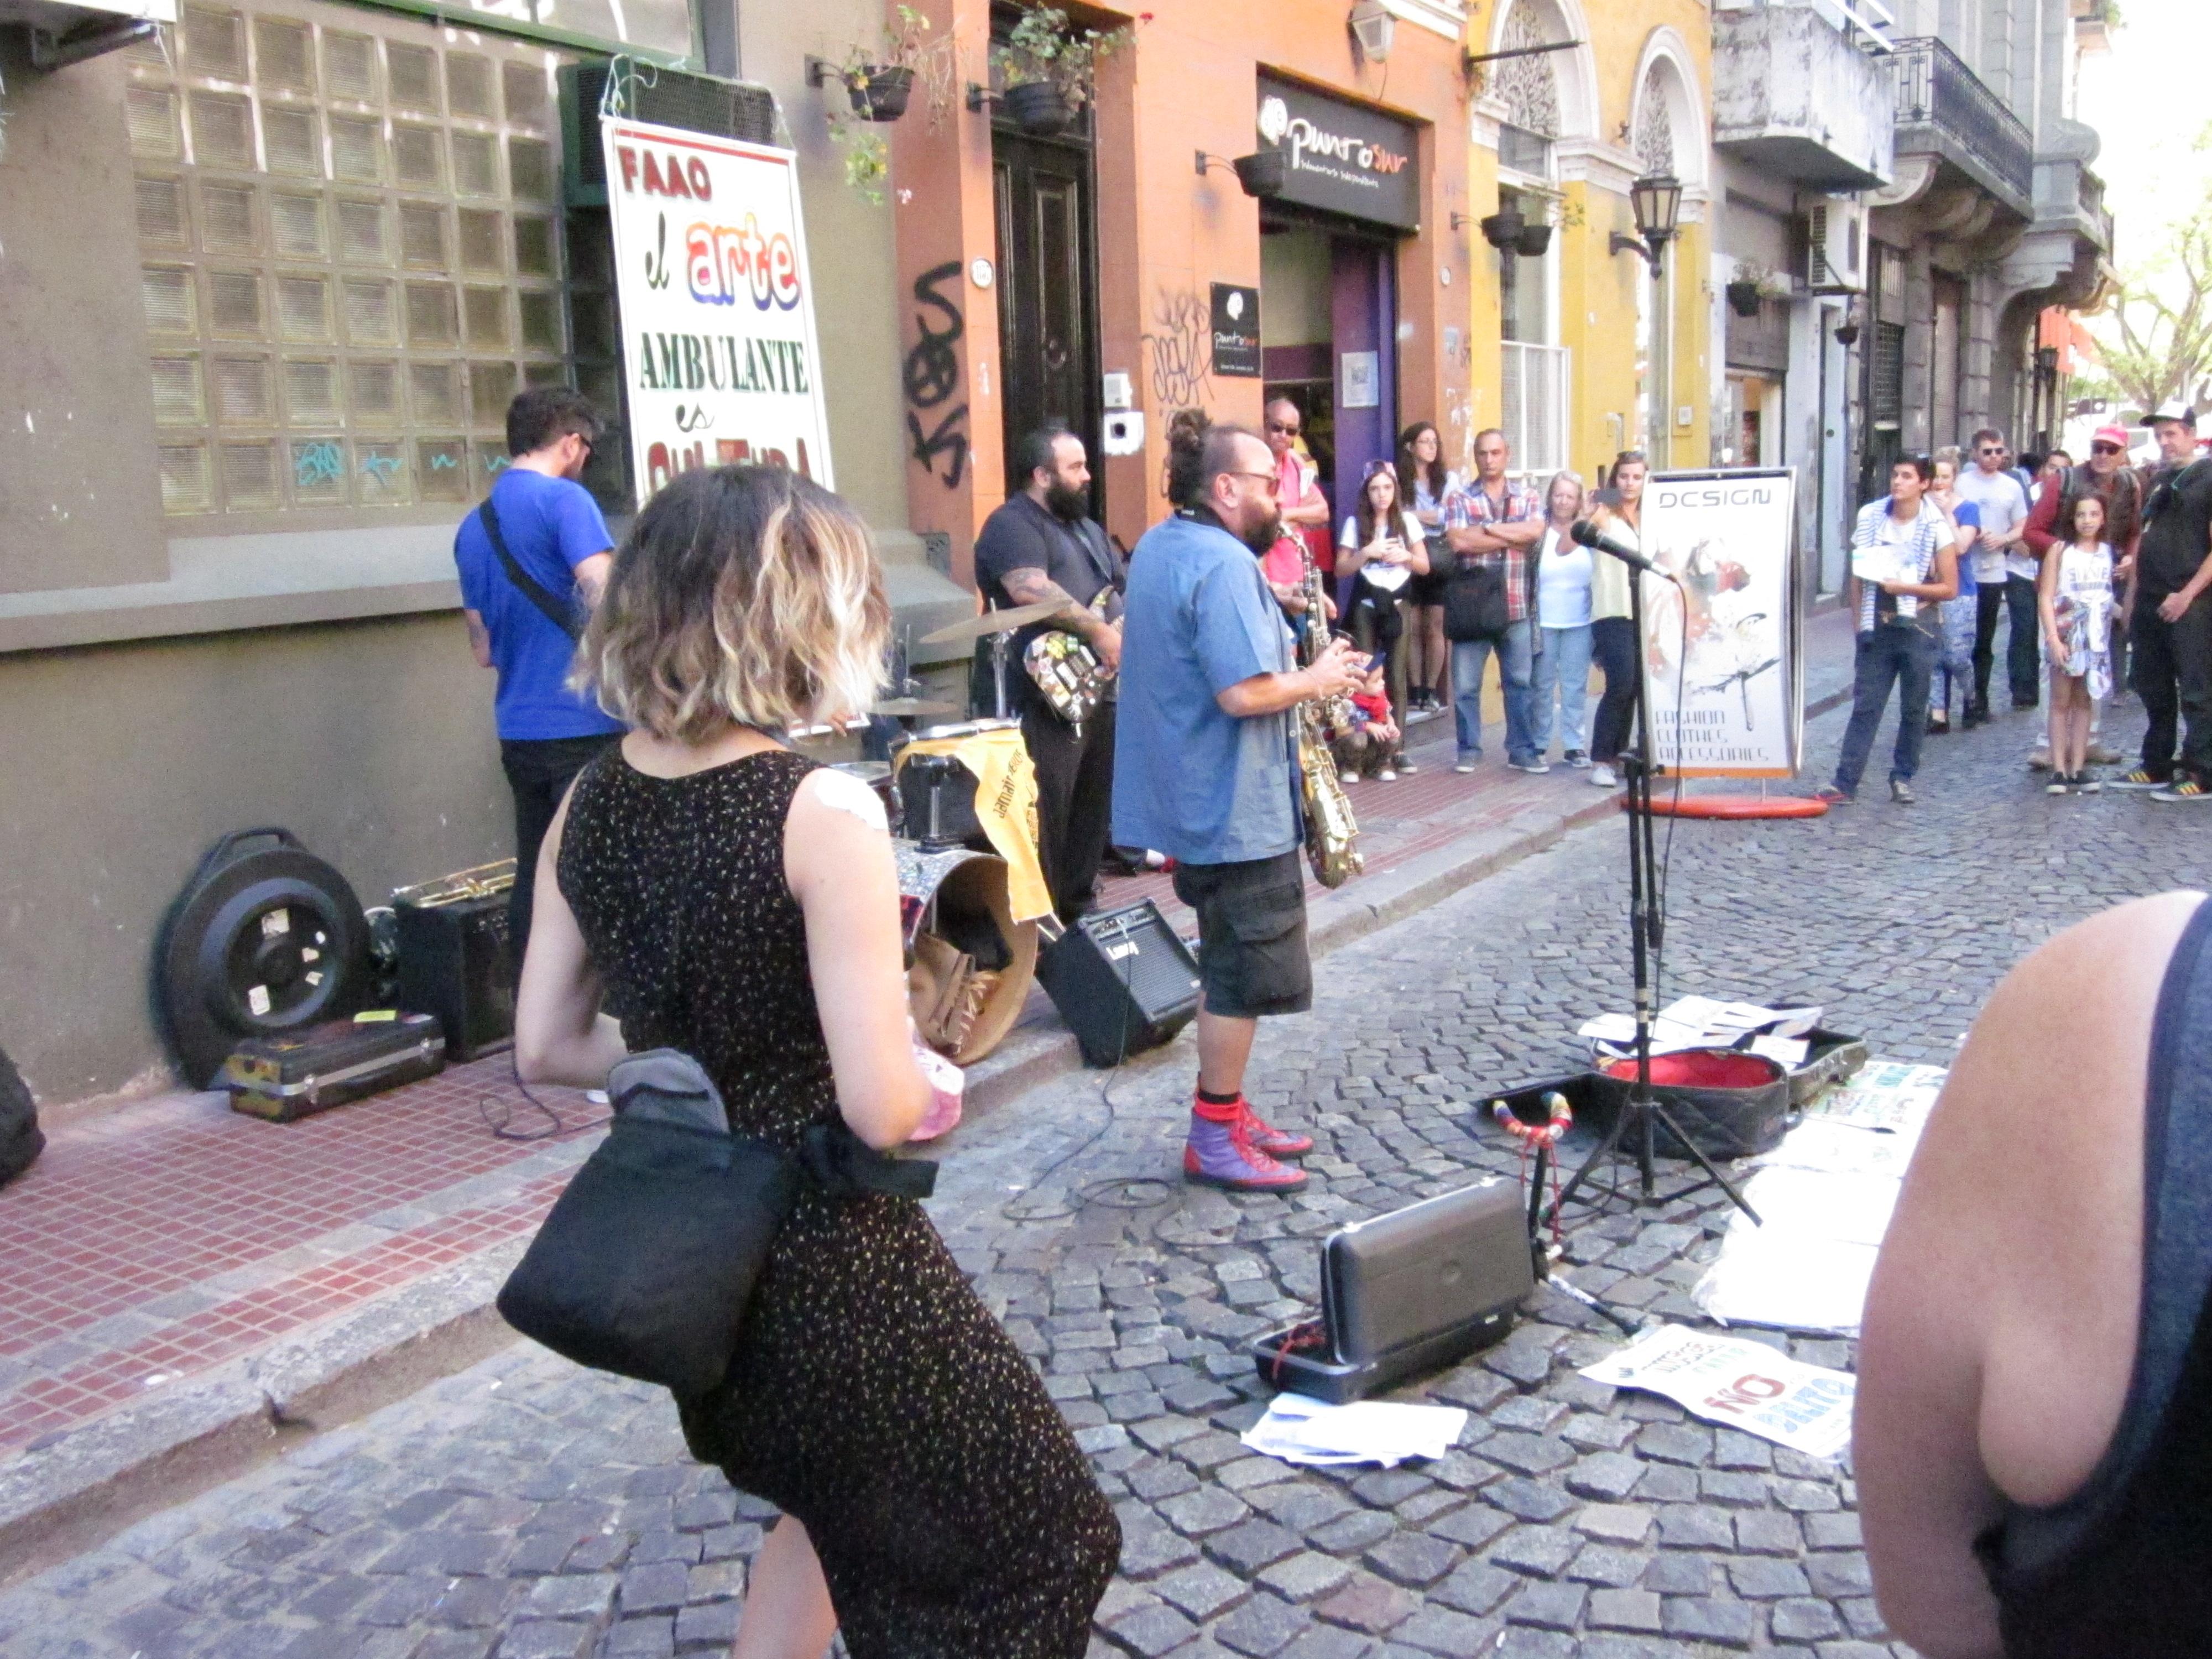 CAPAStudyAbroad_BuenosAires_Spring2016_From_Liz_Hendry_-_Public_street_performers.jpg